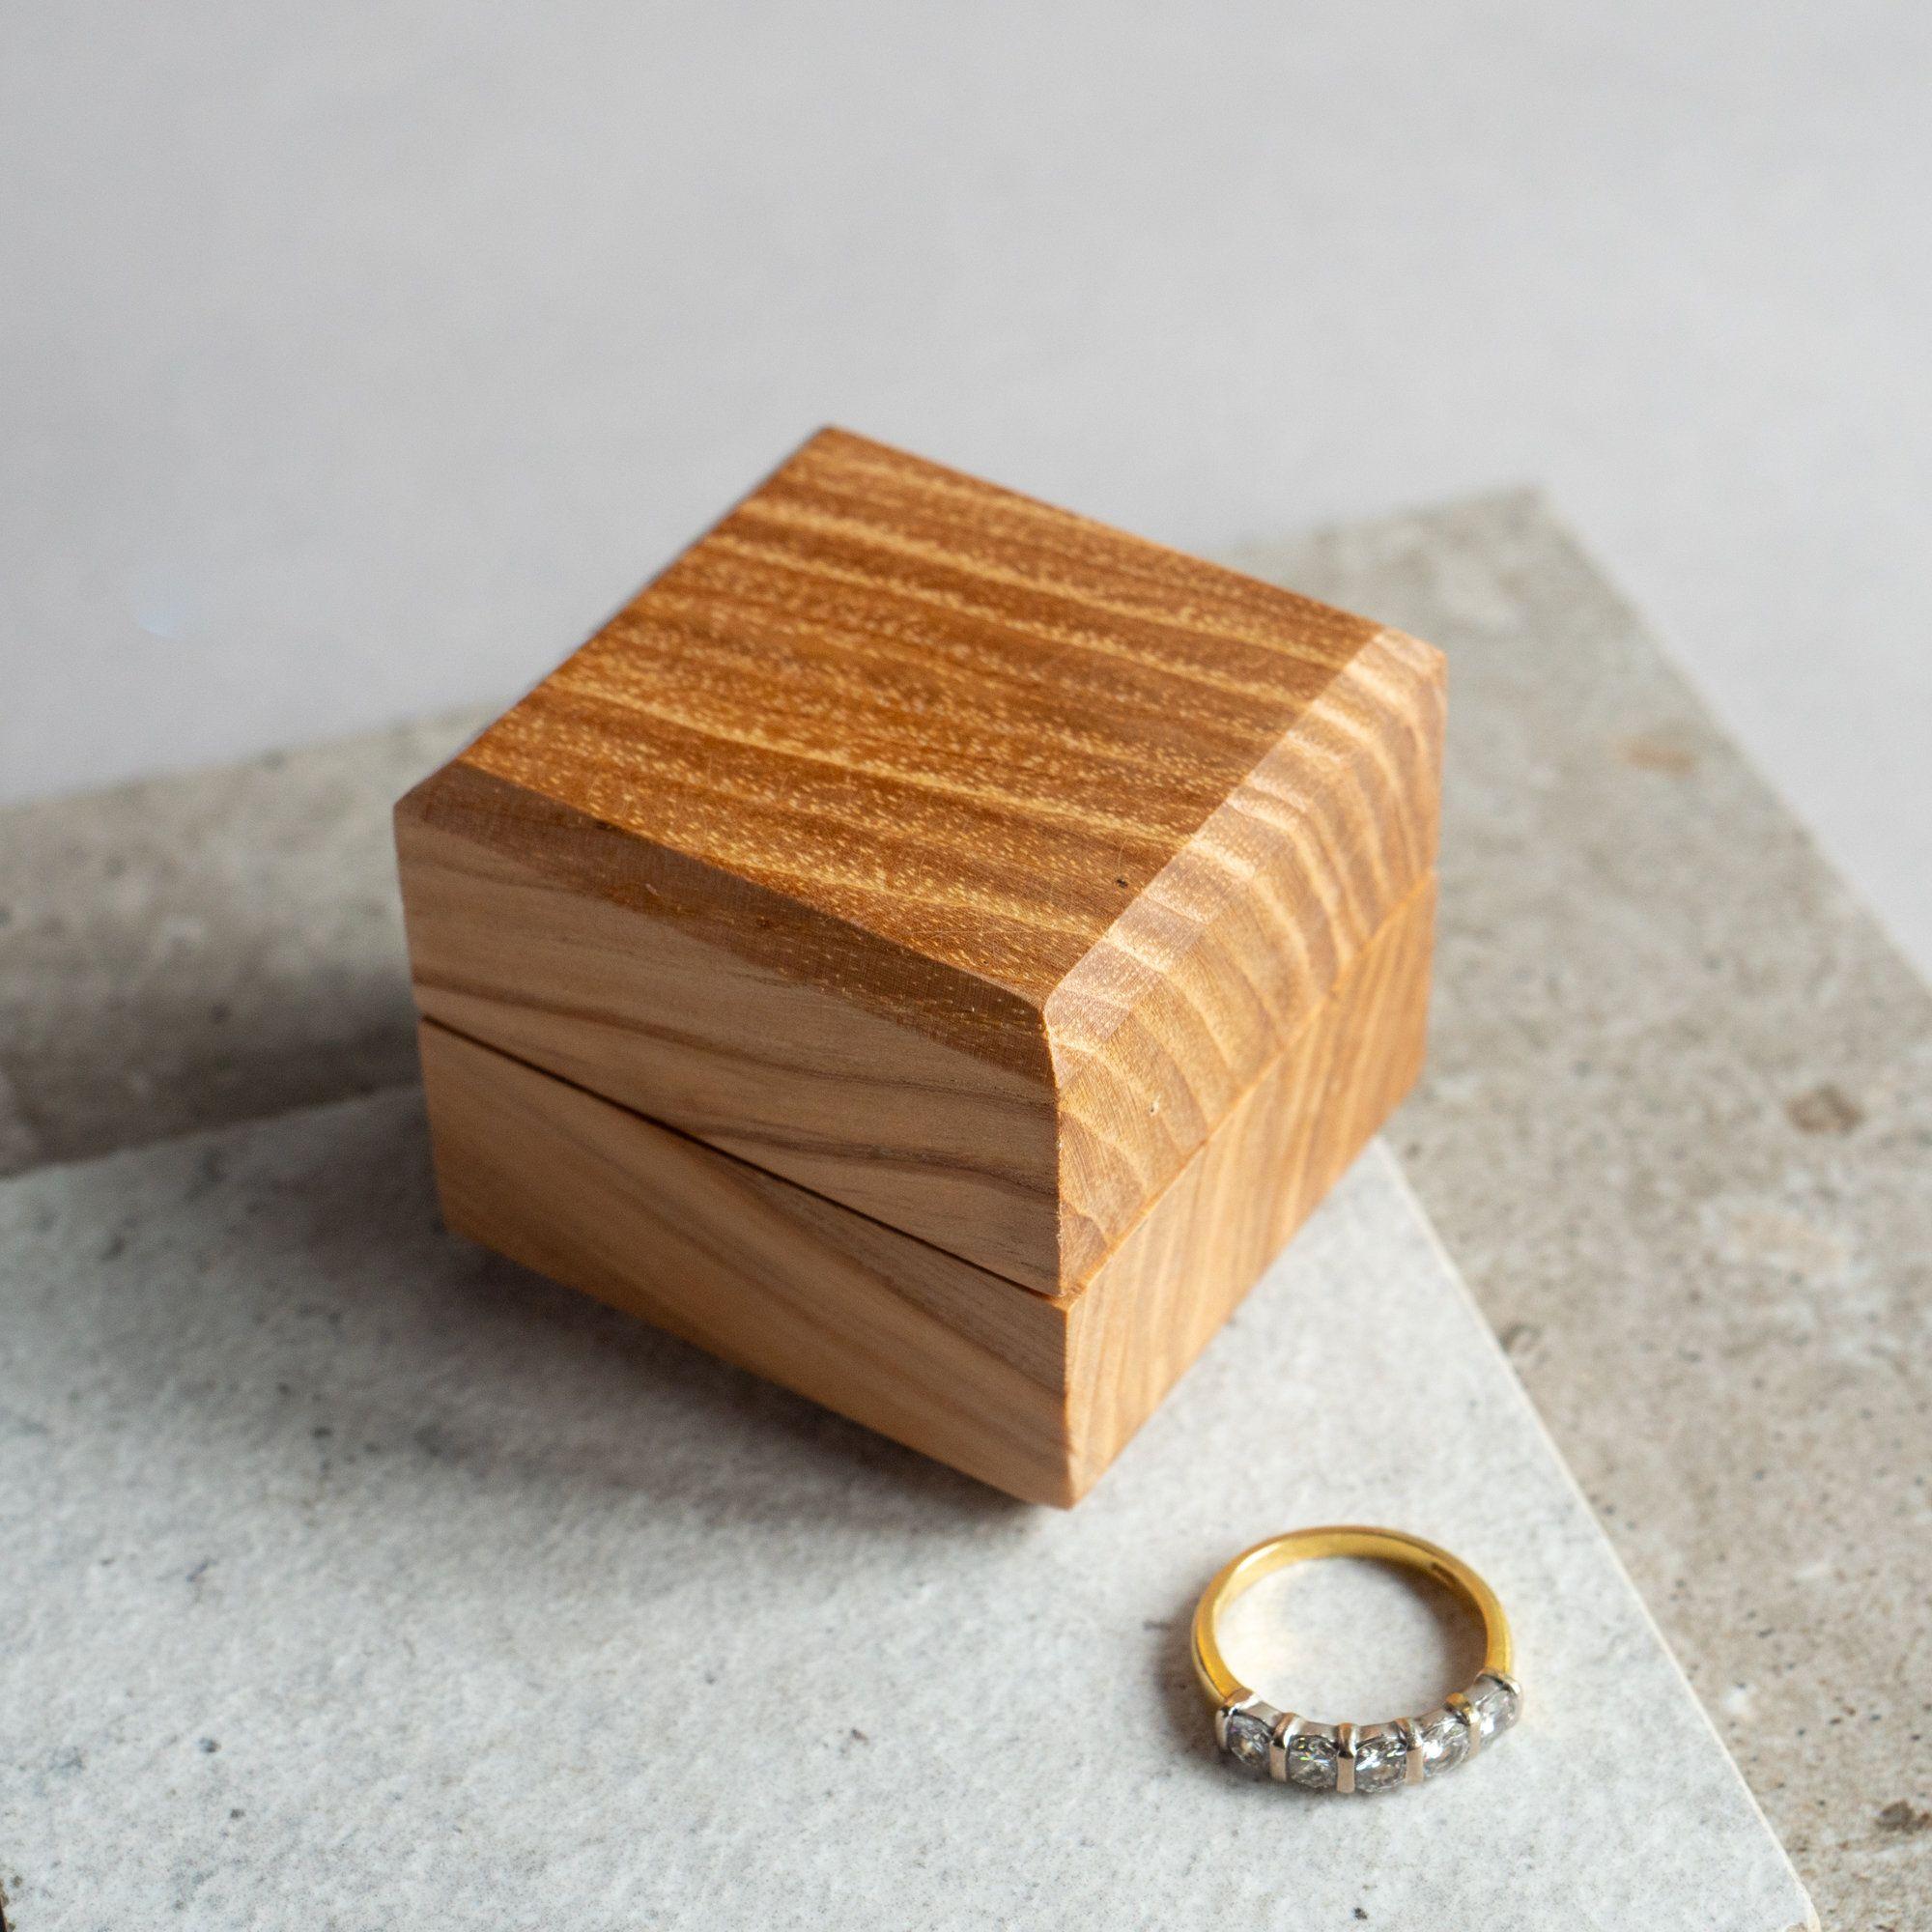 Handmade Wooden Ring Box Engagement Ring Box Wedding Ring Etsy Wooden Rings Wooden Ring Box Etsy Wedding Rings